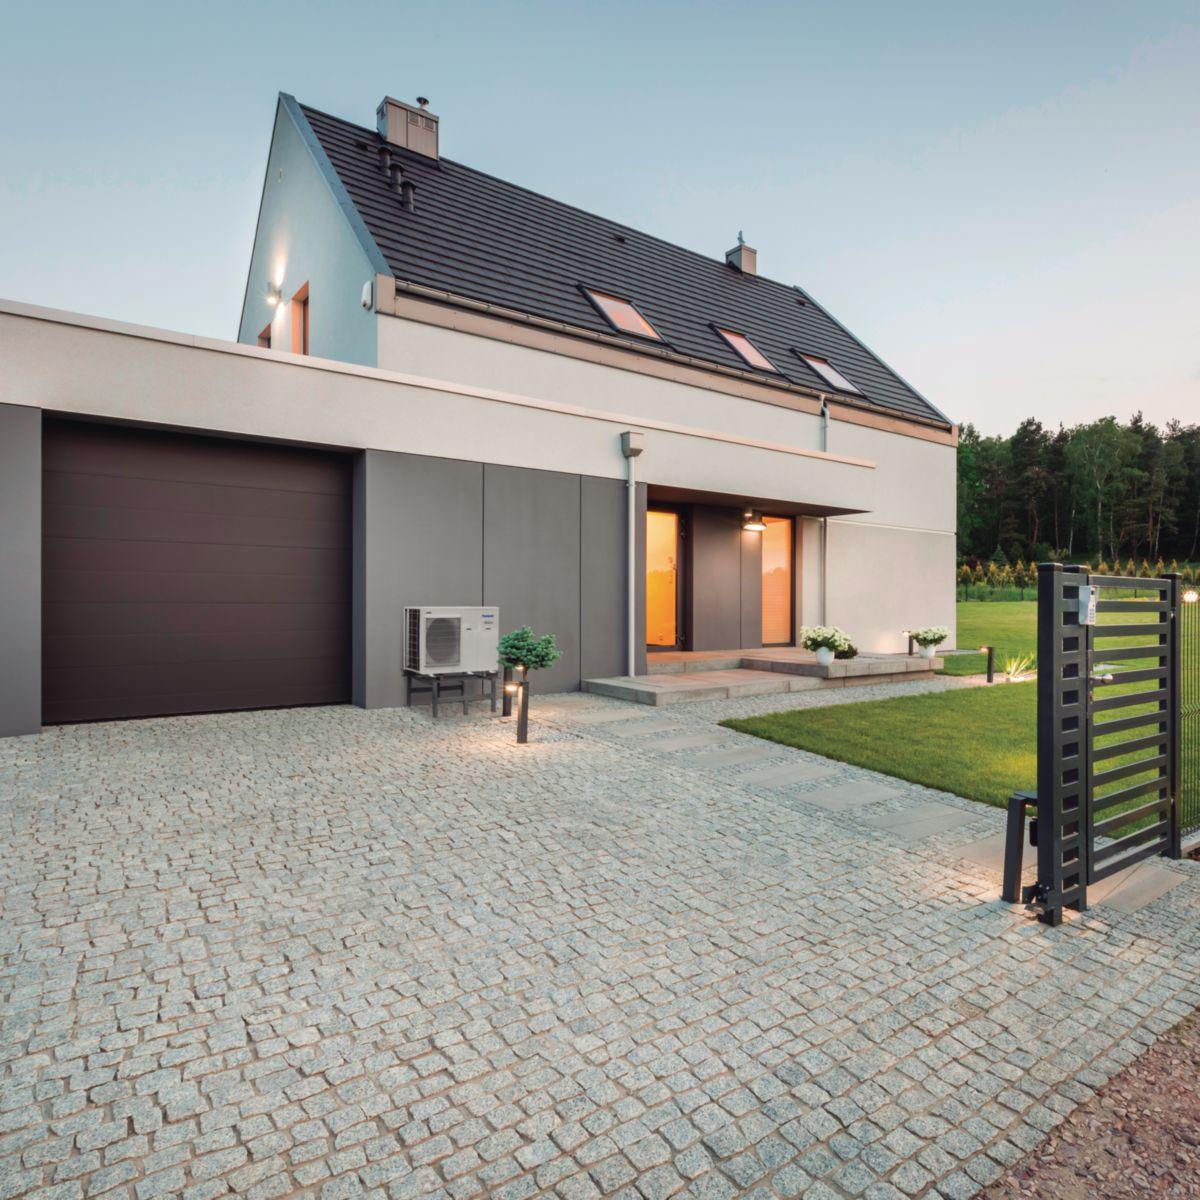 panasonic pac air eau gamme haute performance g n ration. Black Bedroom Furniture Sets. Home Design Ideas